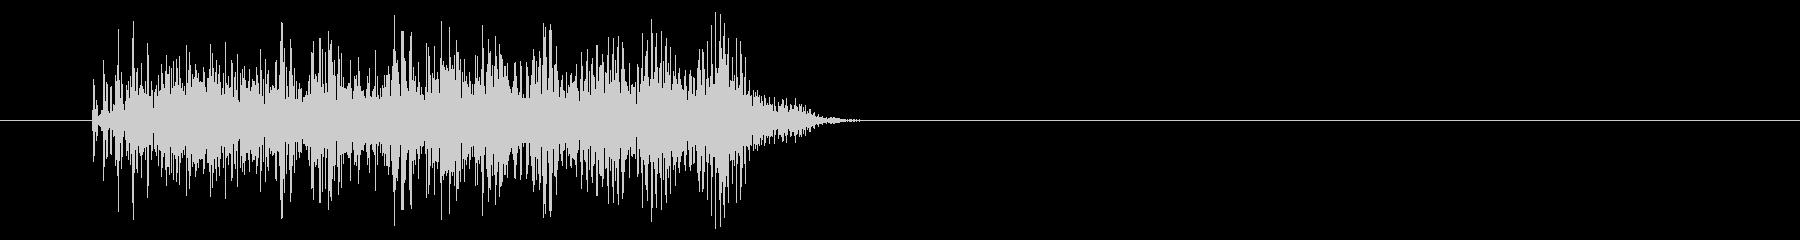 8bitノイズup-02-5_dryの未再生の波形